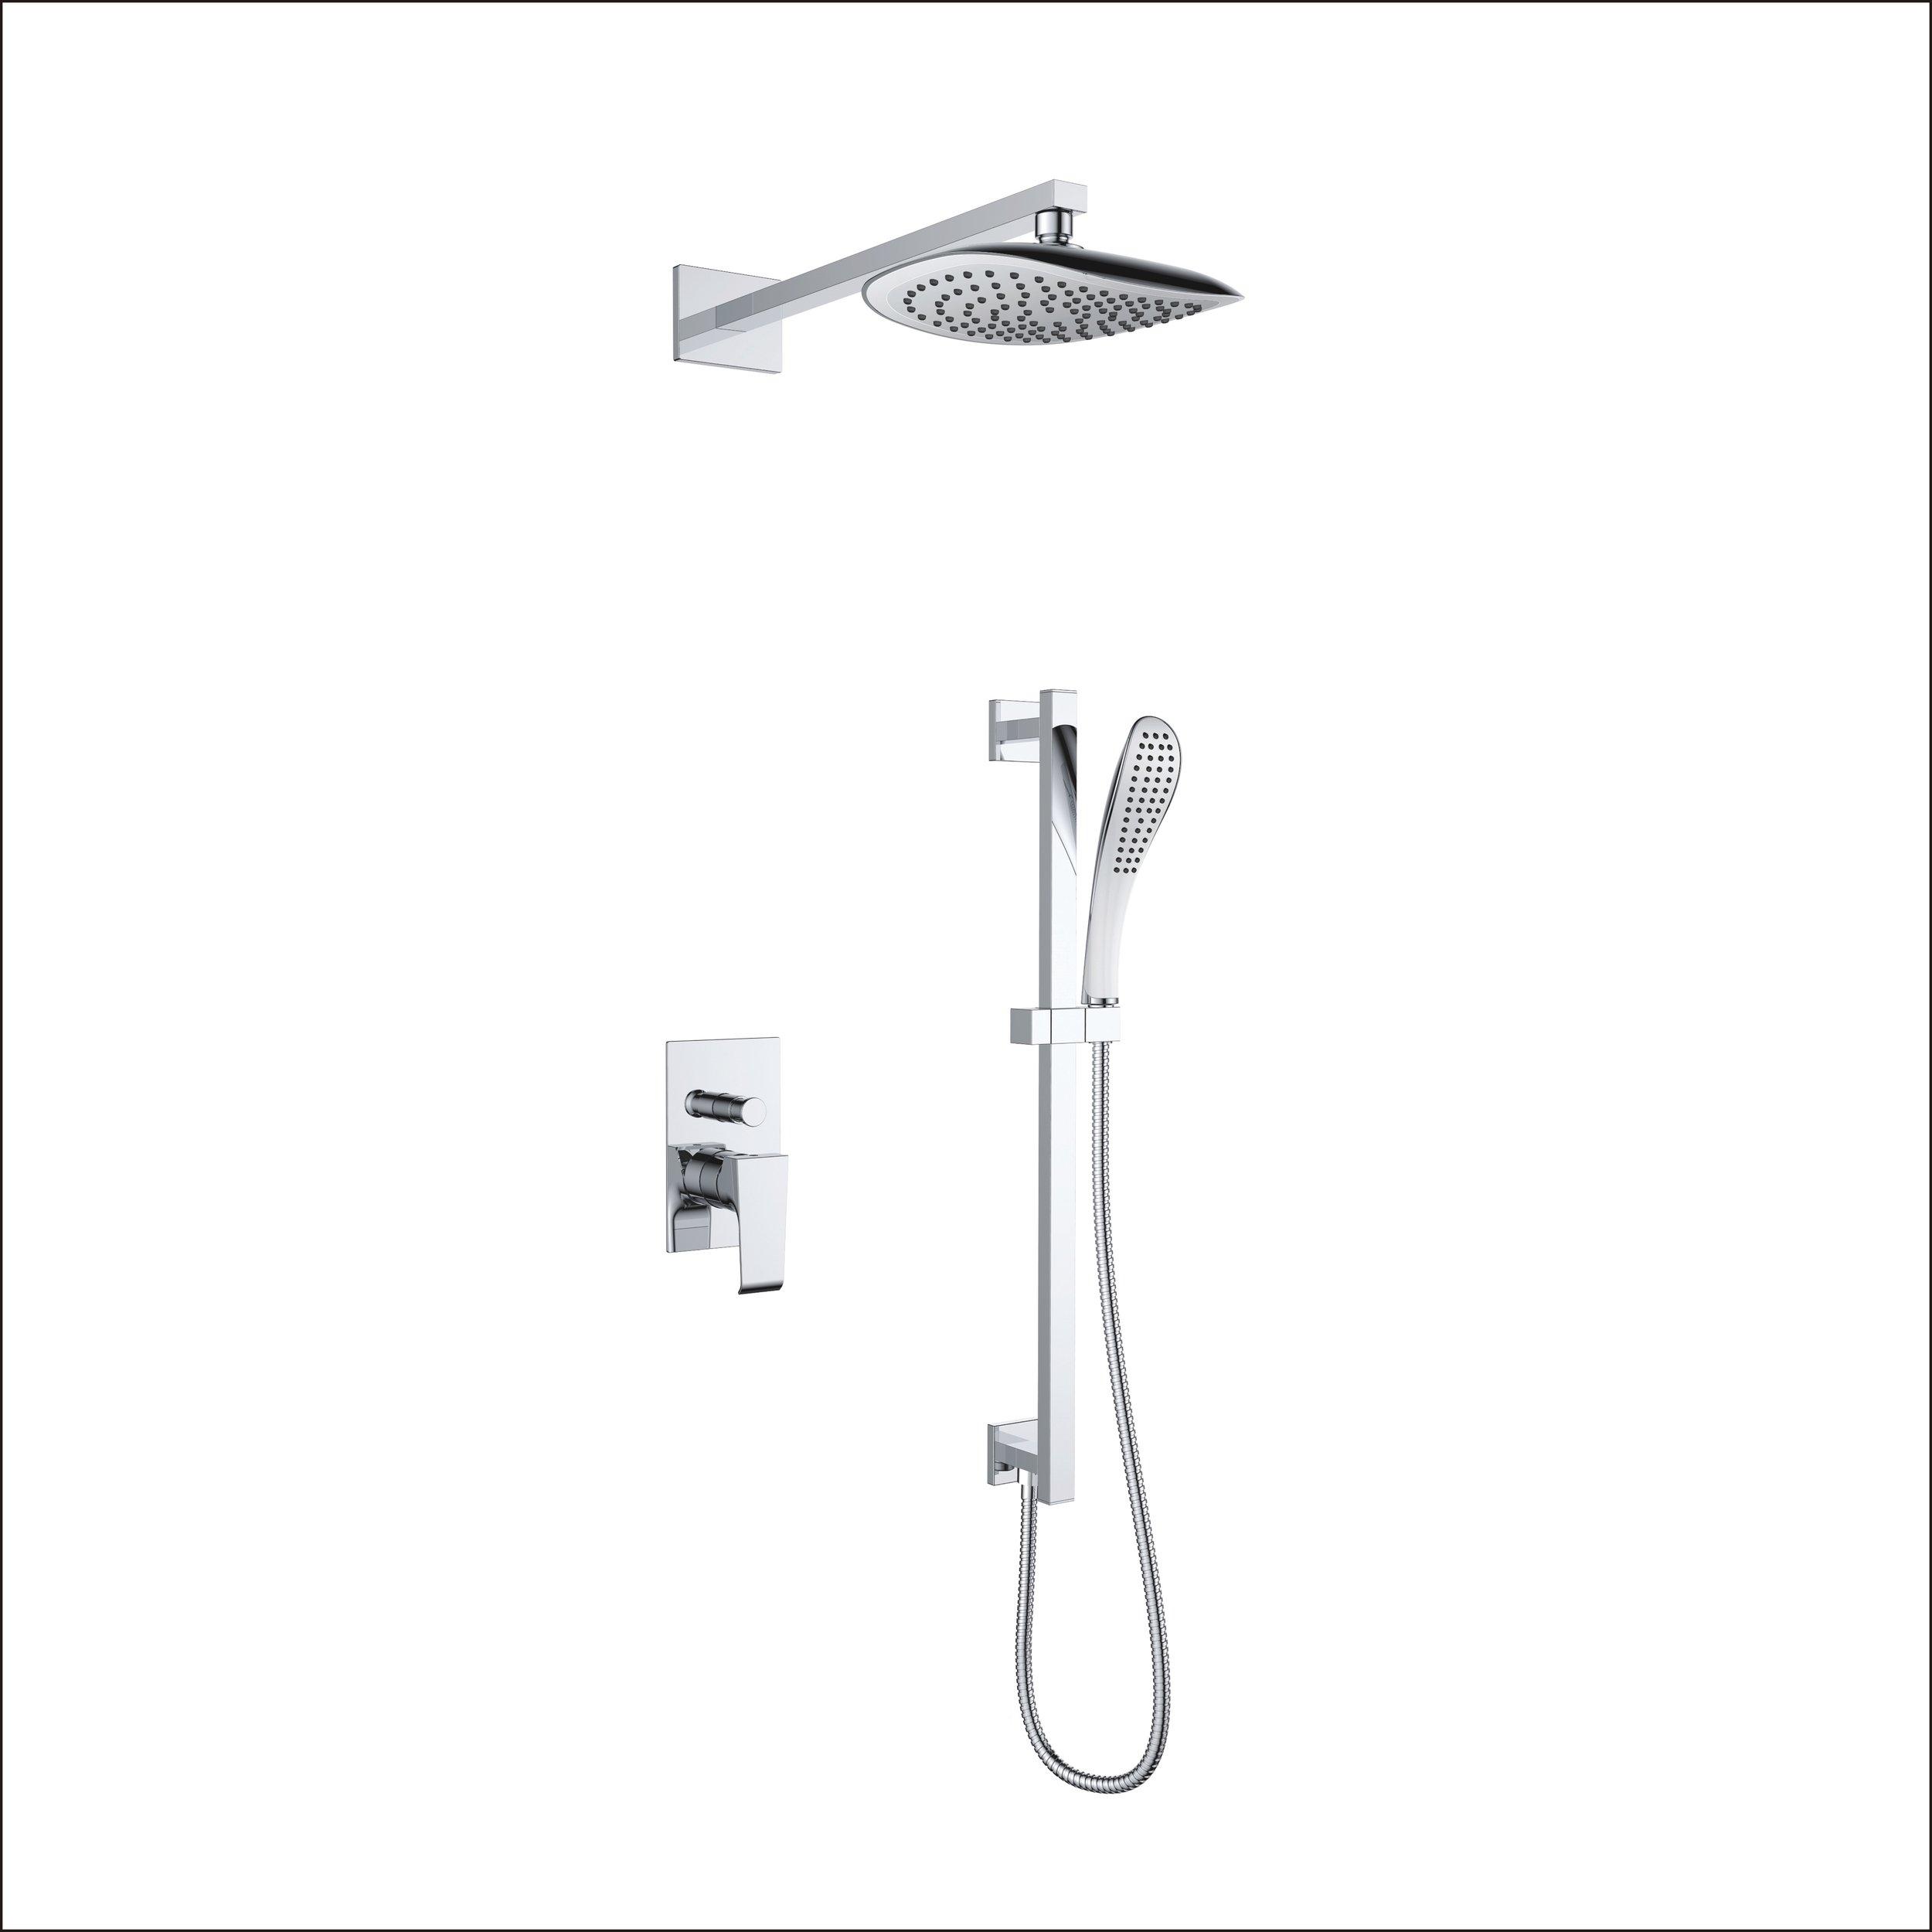 7167-104:Concealed shower valve with shower set and head shower